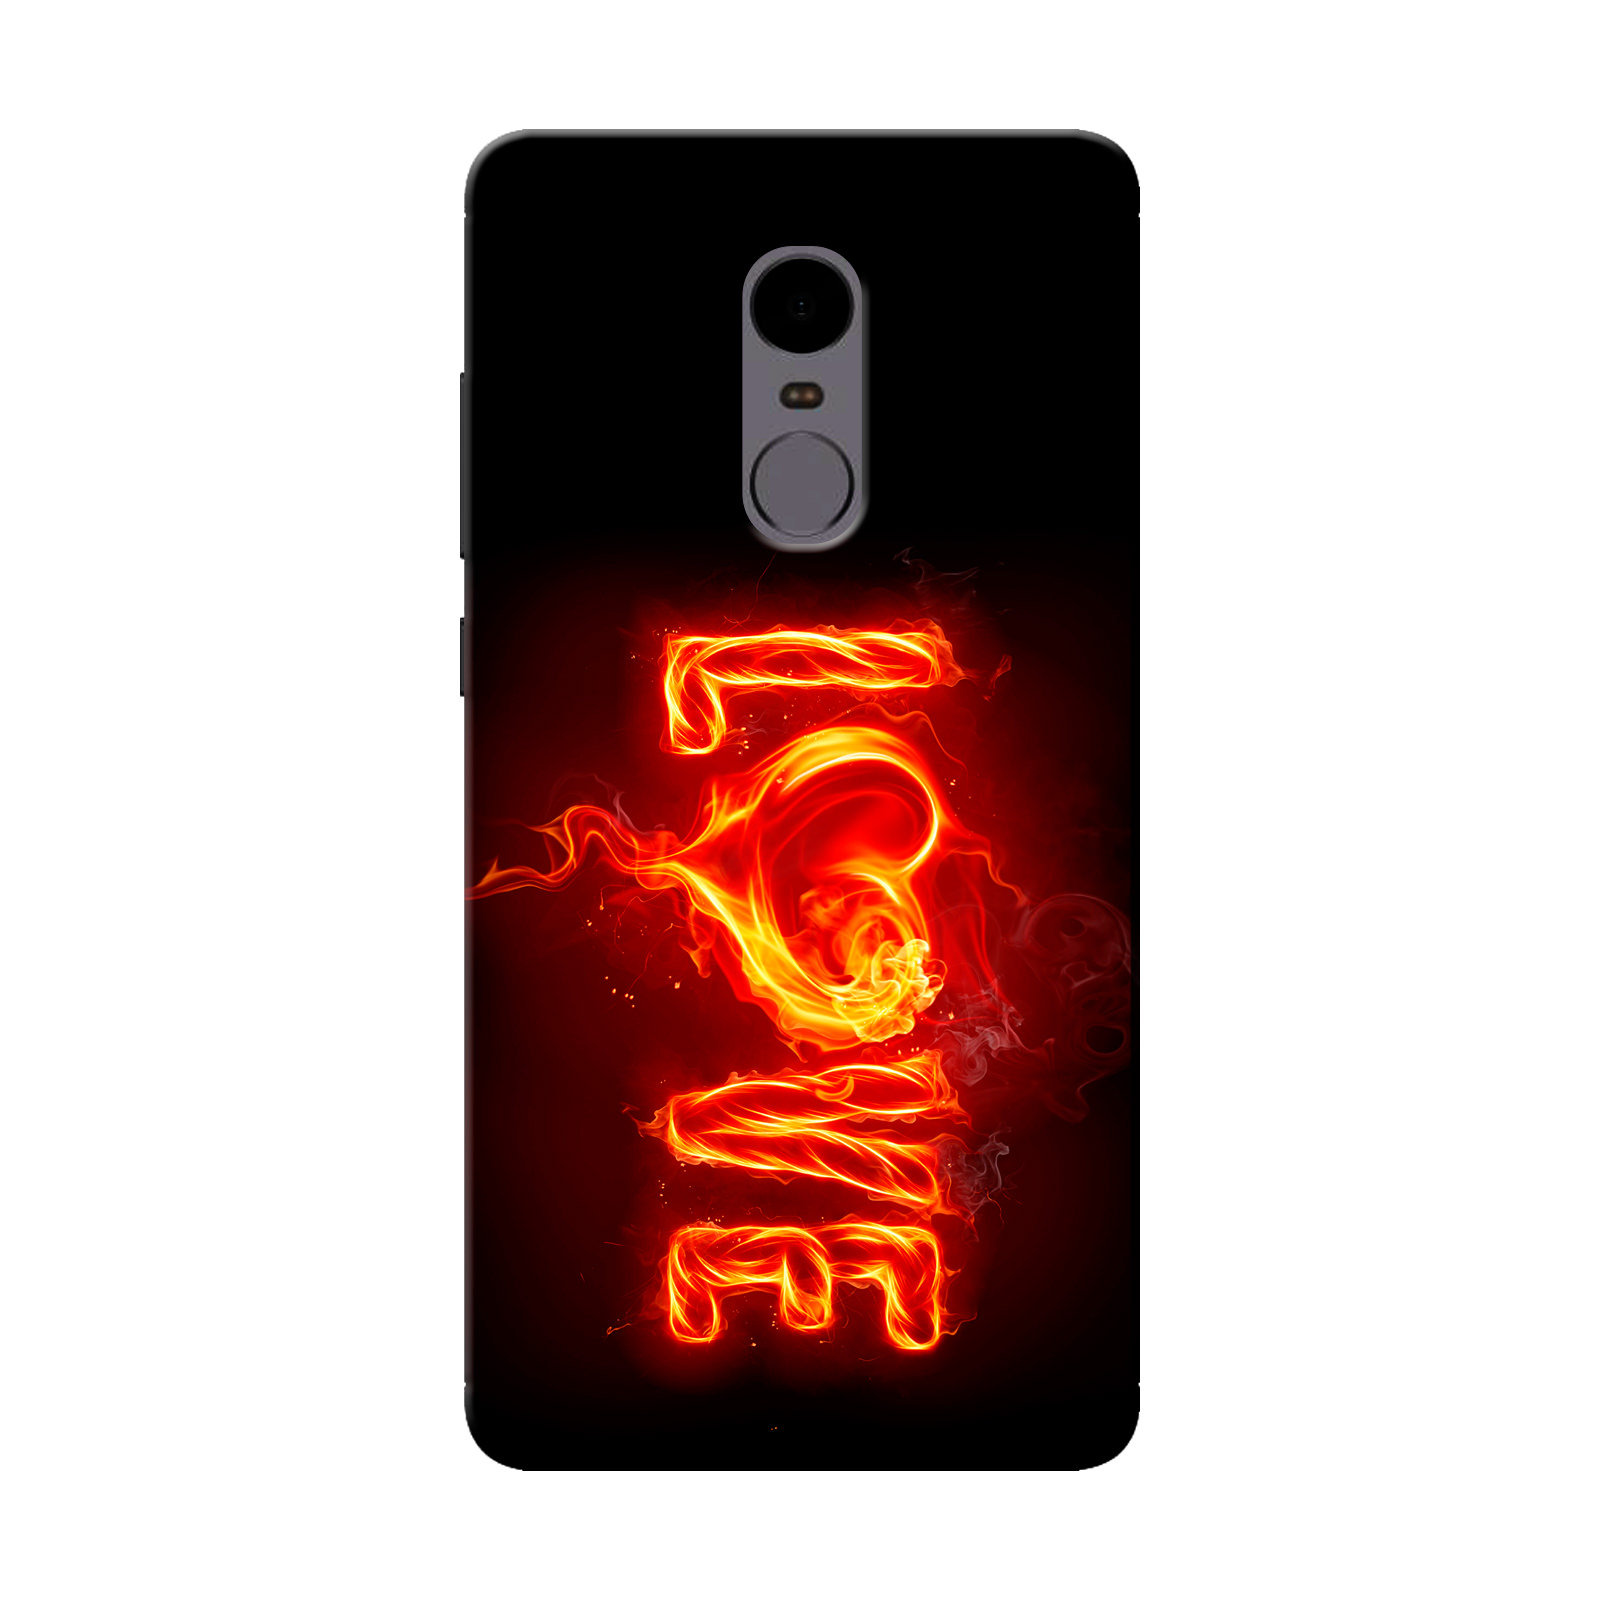 sairafashions Wild Thunder Mi Redmi Note 4 Mobile Back Cover Case And Designer Printed Hard Flexible Mobile Case Cover  - 1141